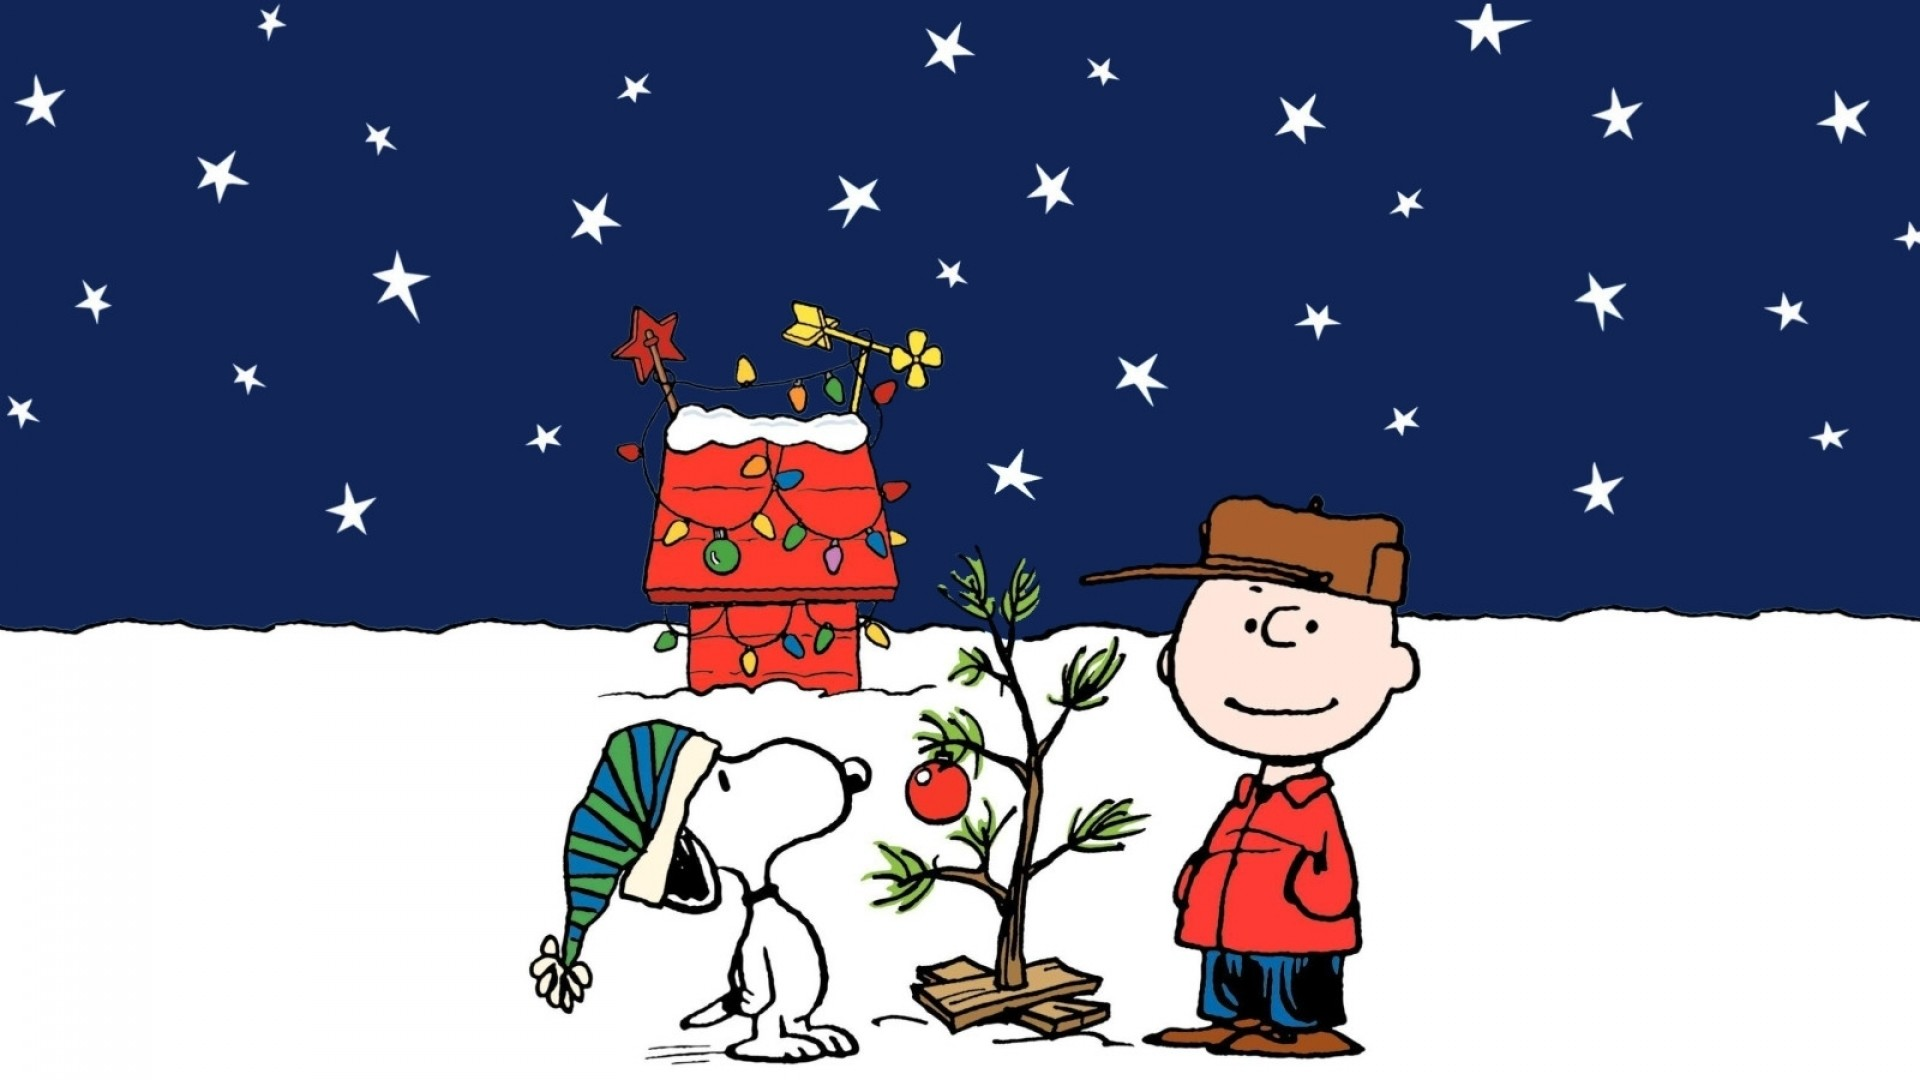 CHARLIE BROWN peanuts comics snoopy christmas gg wallpaper   .